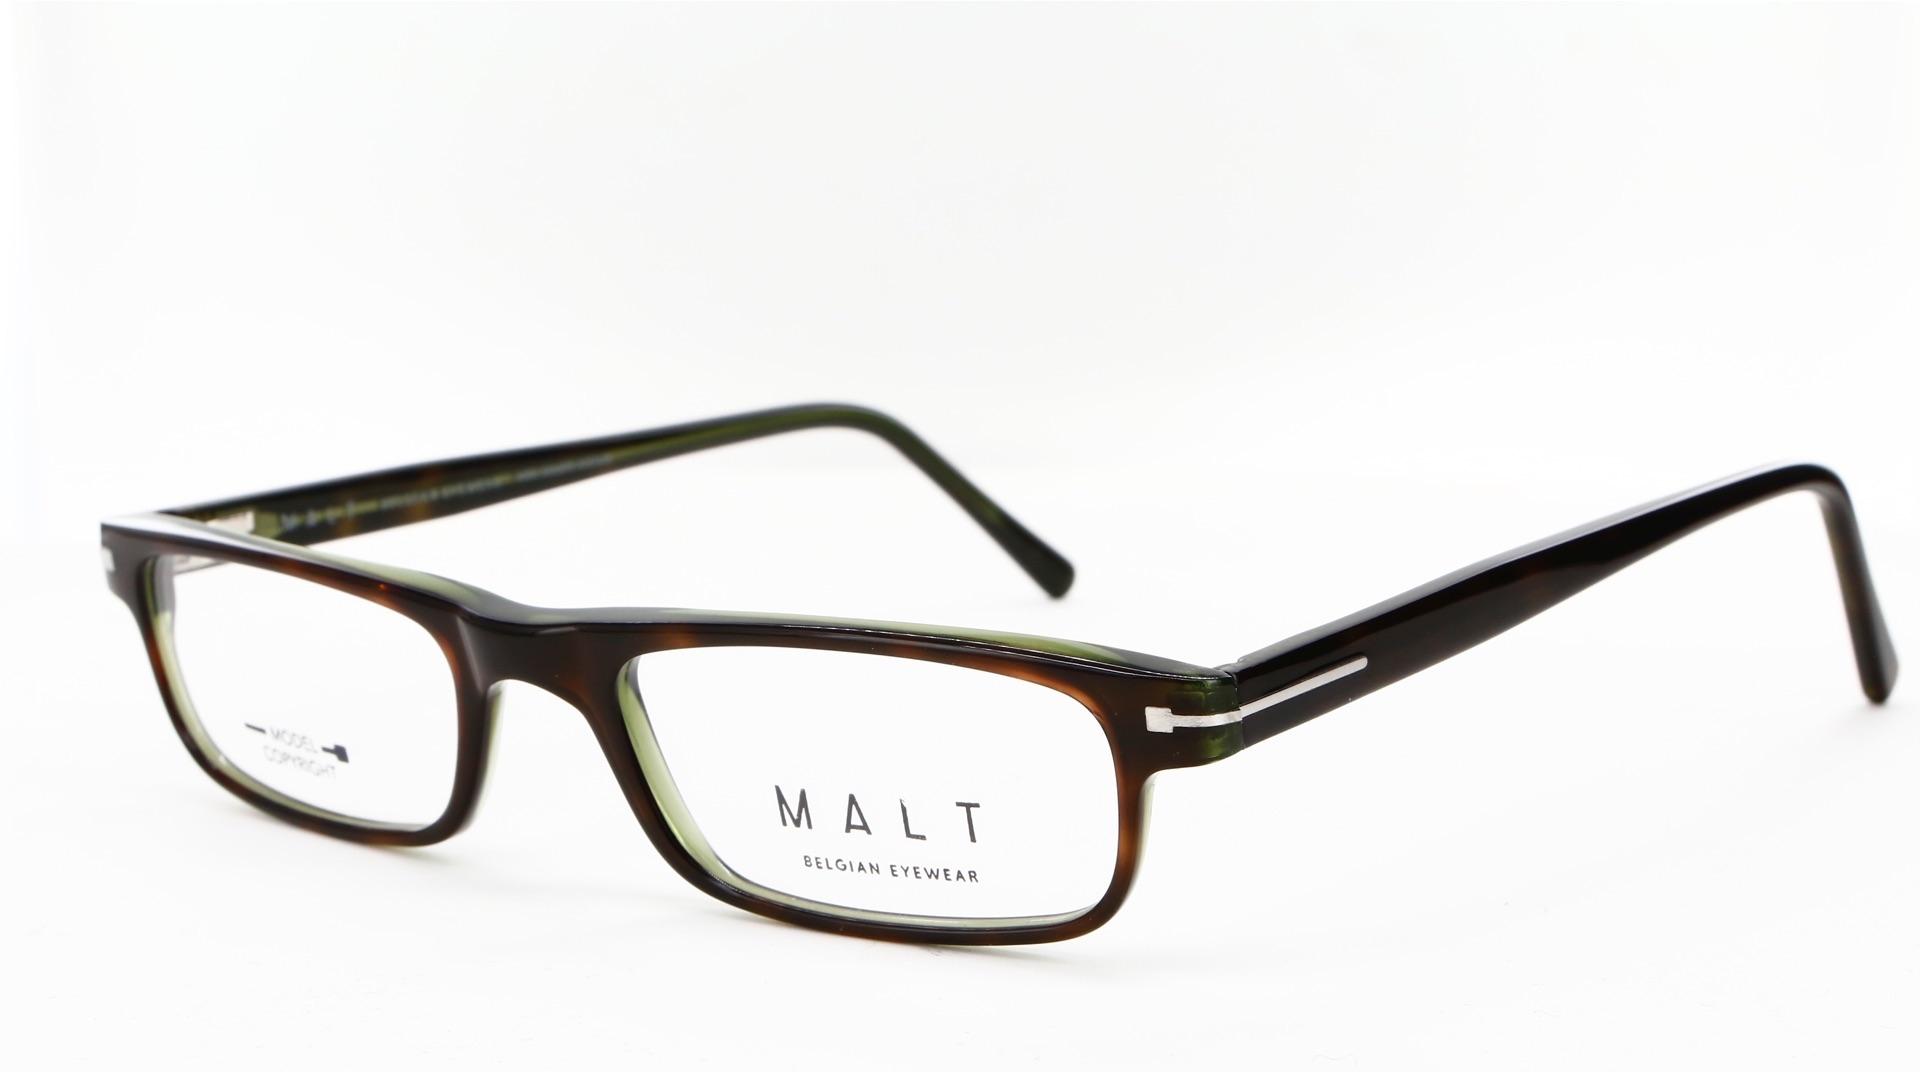 Malt - ref: 78710